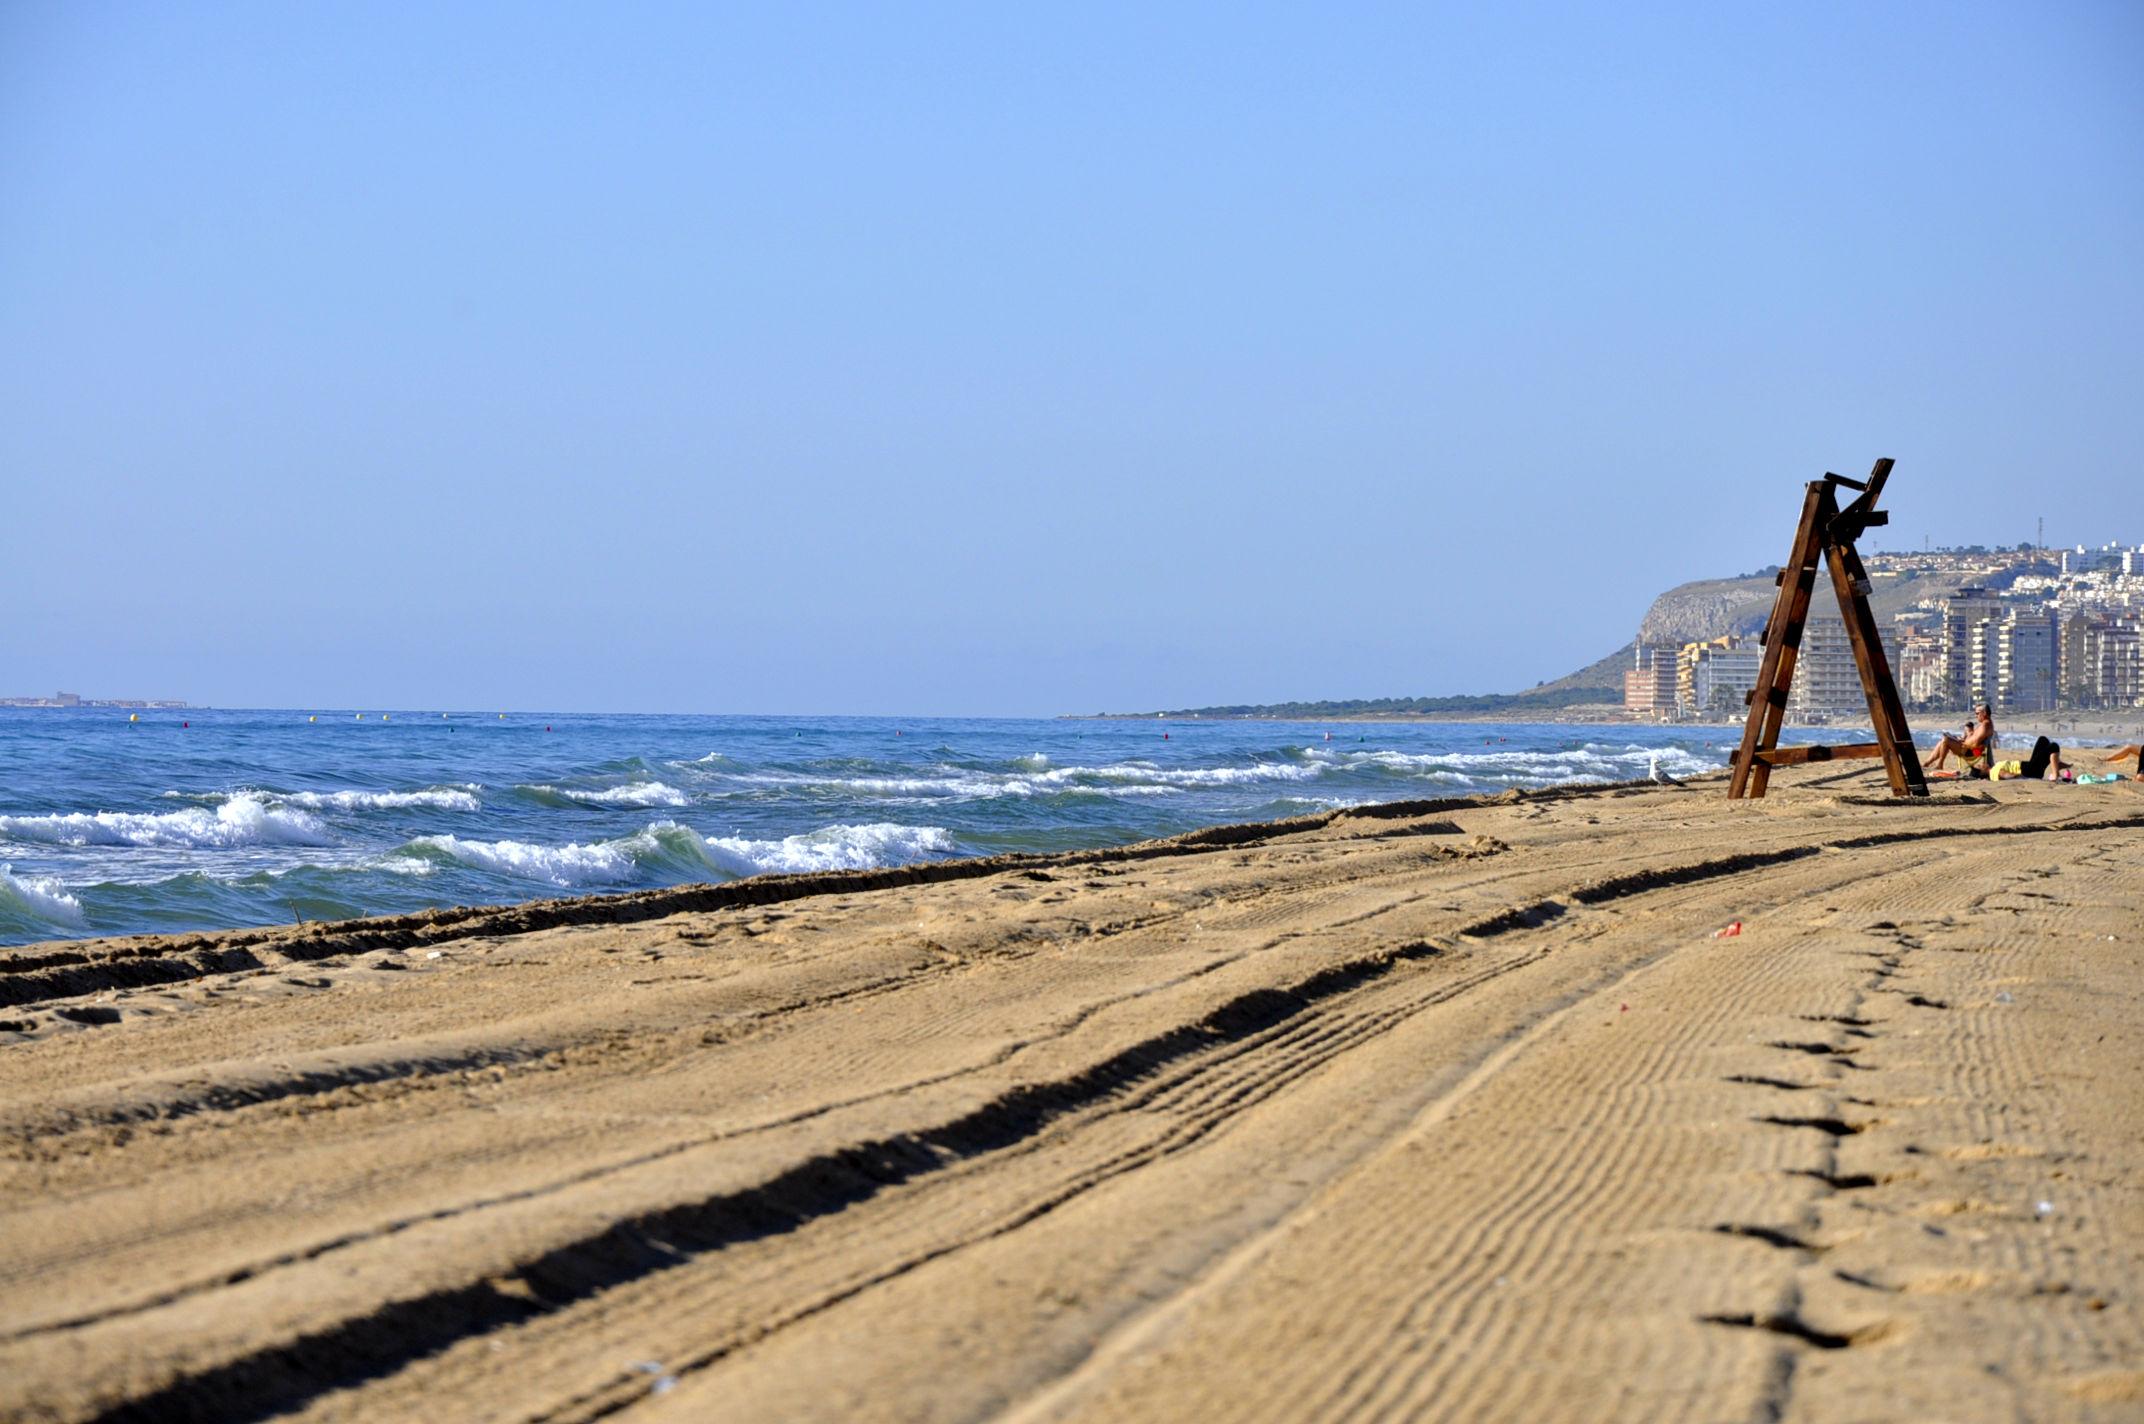 Alicante beaches - ALICANTE City & Beach